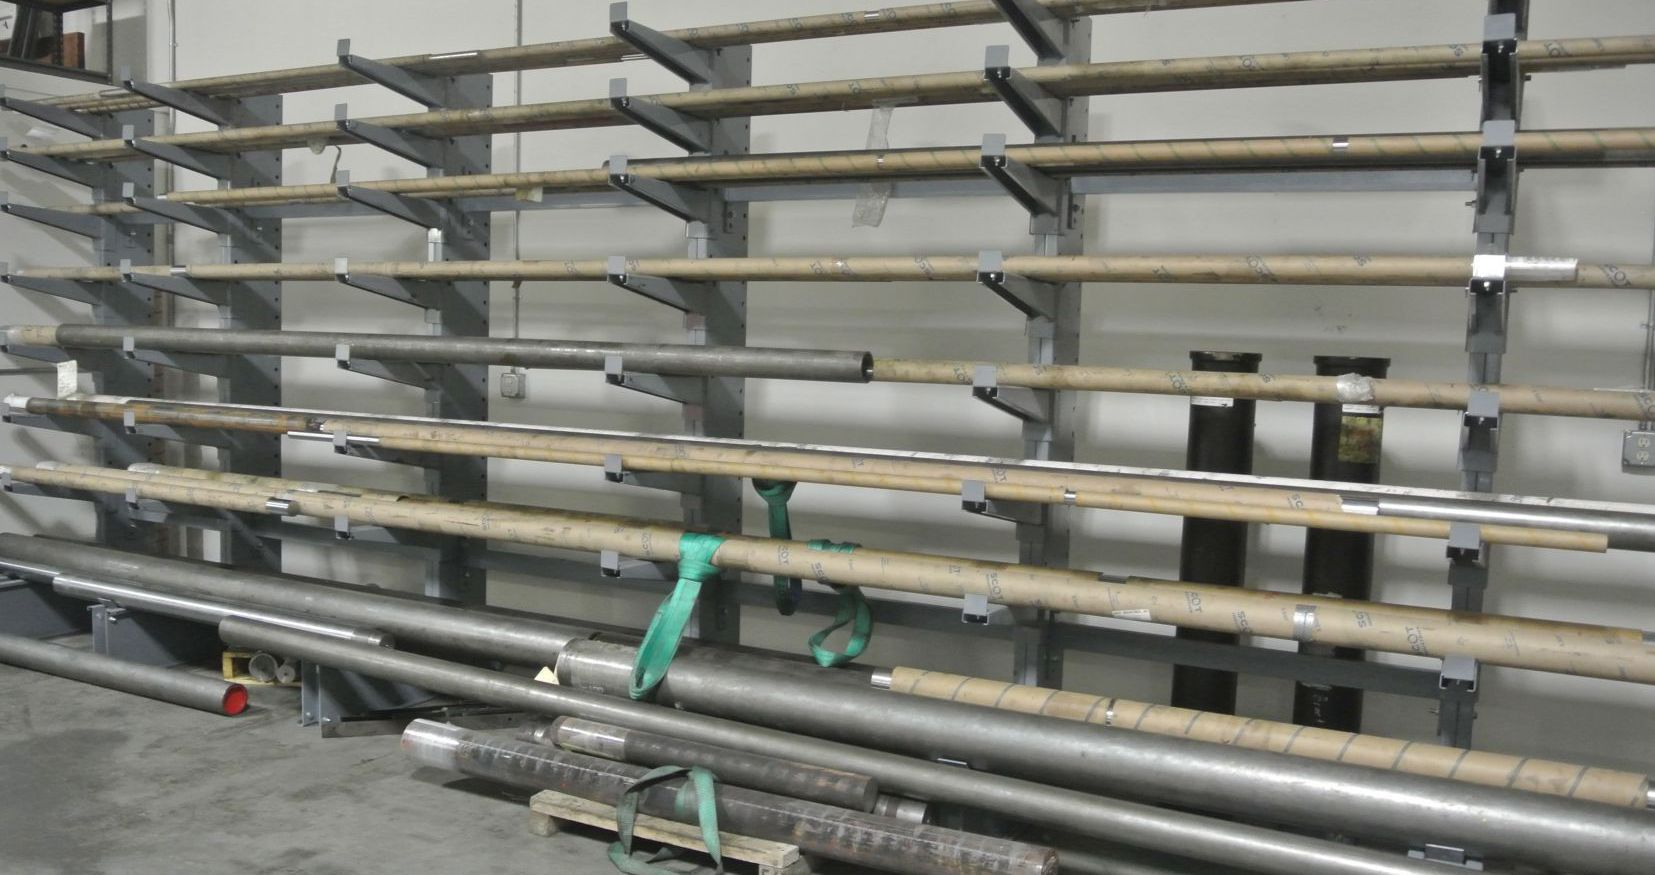 Hydraulic material, rod, barrel, cast iron